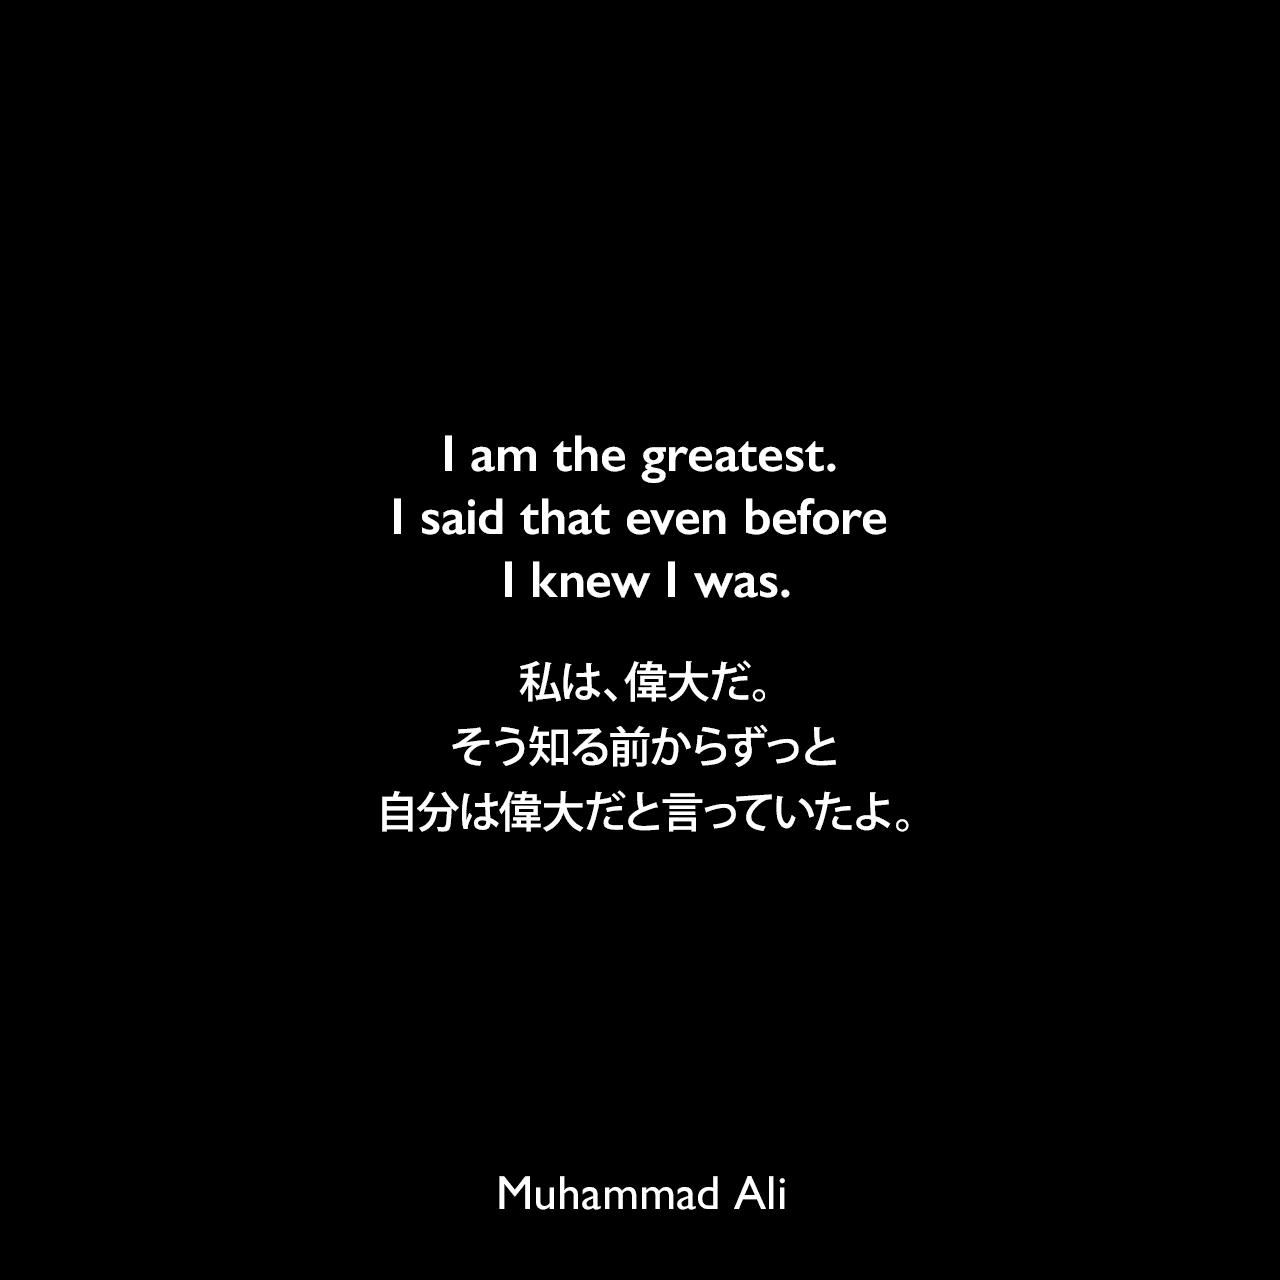 I am the greatest. I said that even before I knew I was.私は、偉大だ。そう知る前からずっと自分は偉大だと言っていたよ。Muhammad Ali